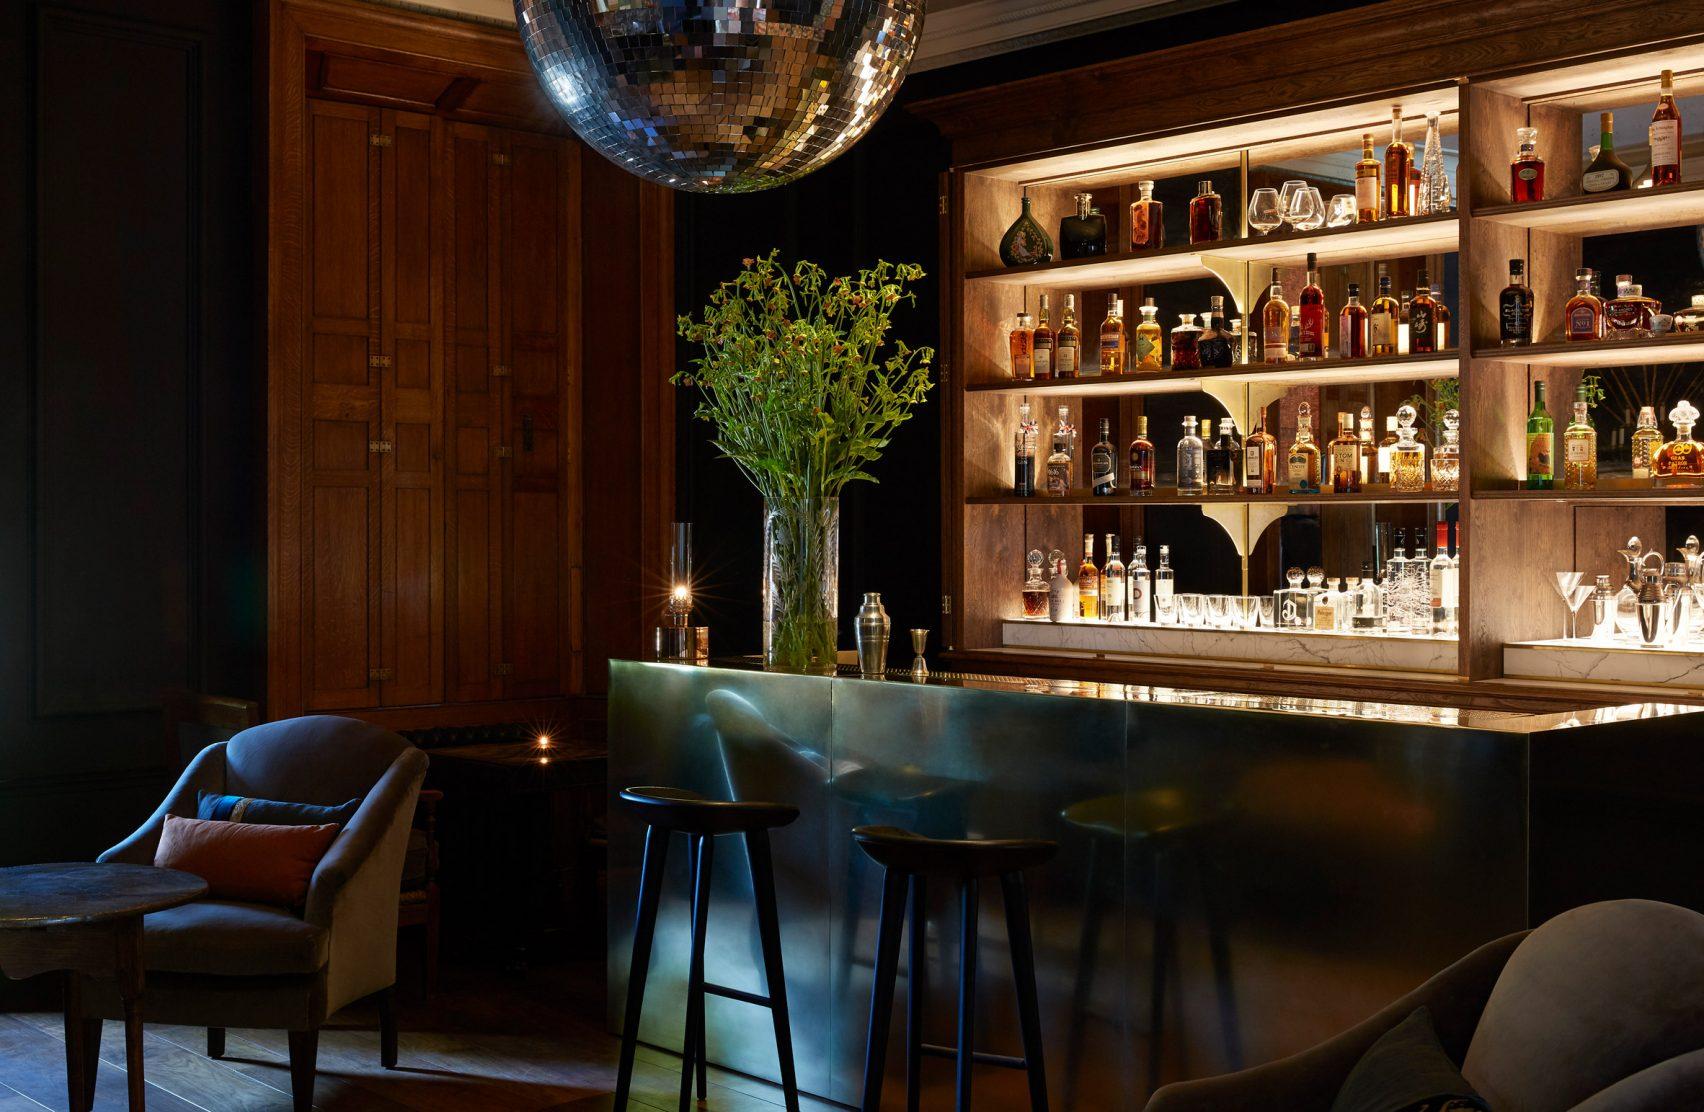 Bar ristorante / Peter Cook